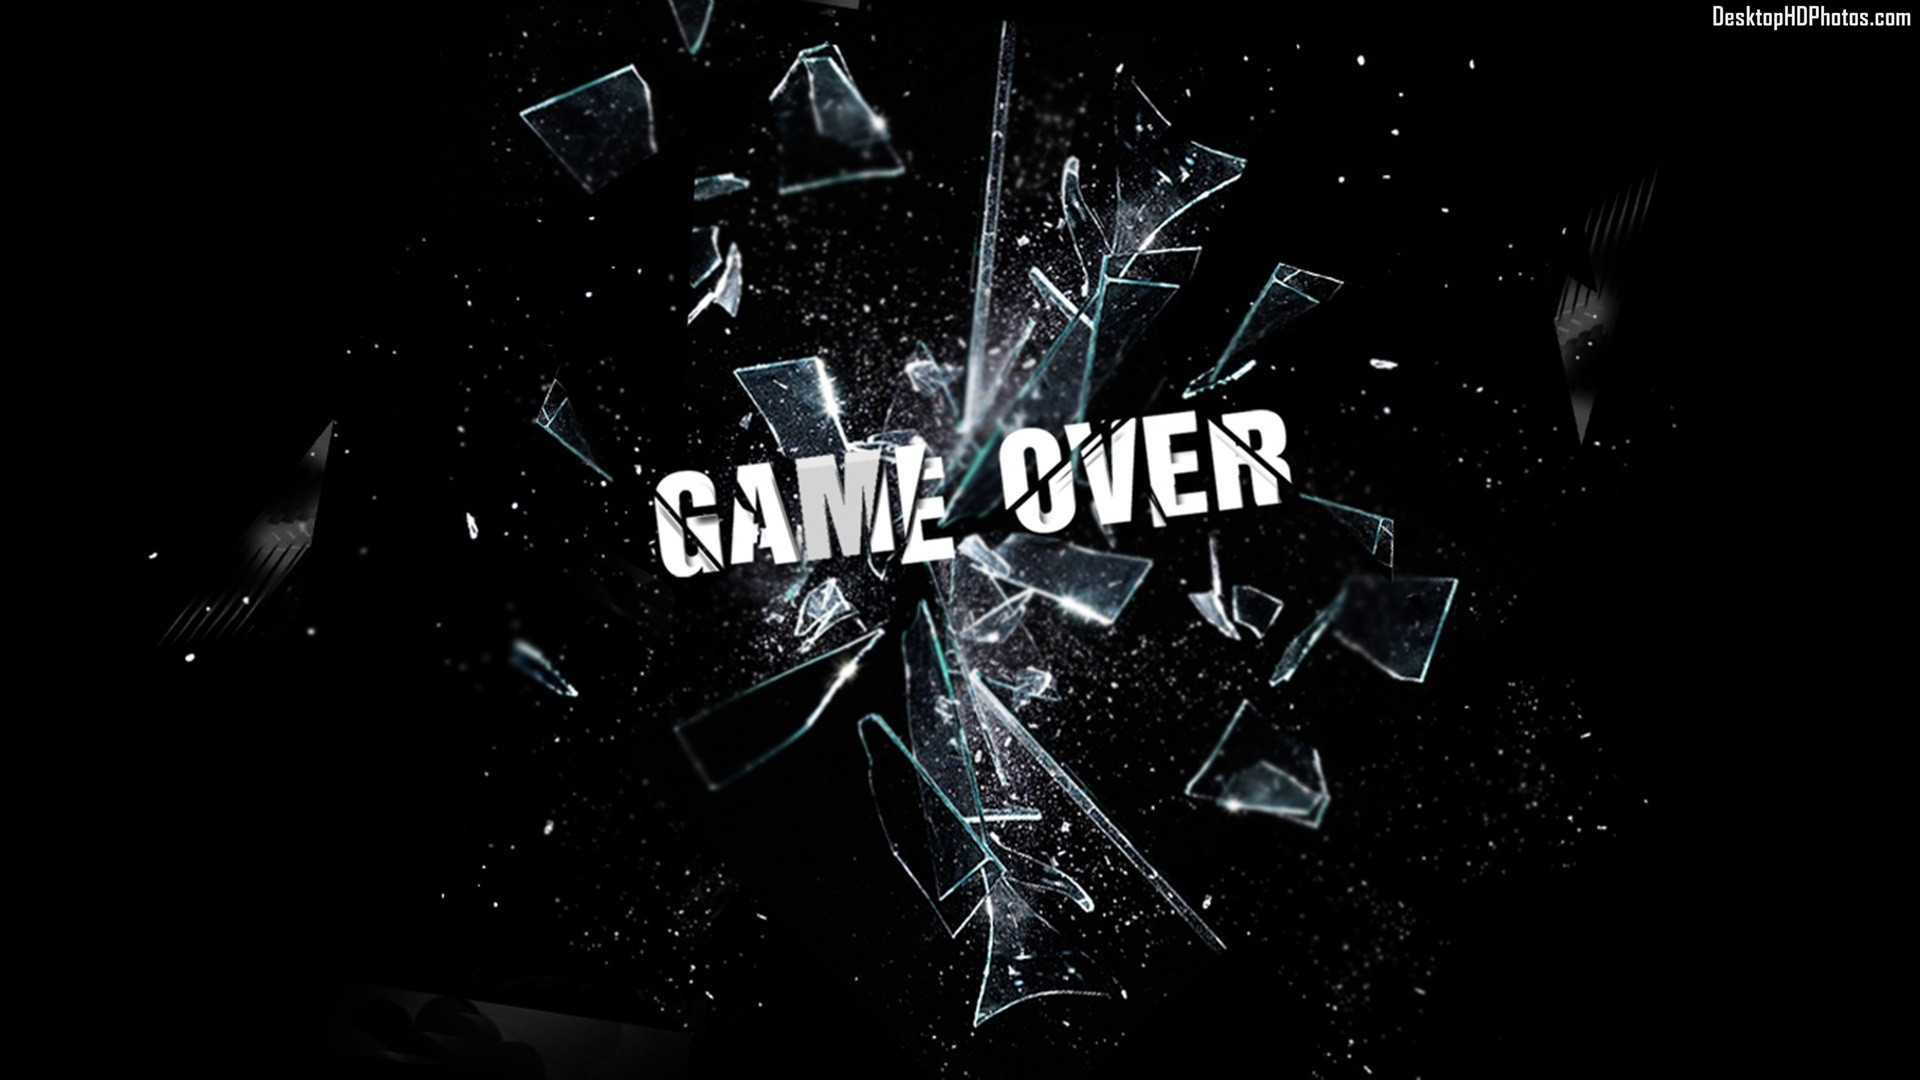 Game over wallpaper - SF Wallpaper